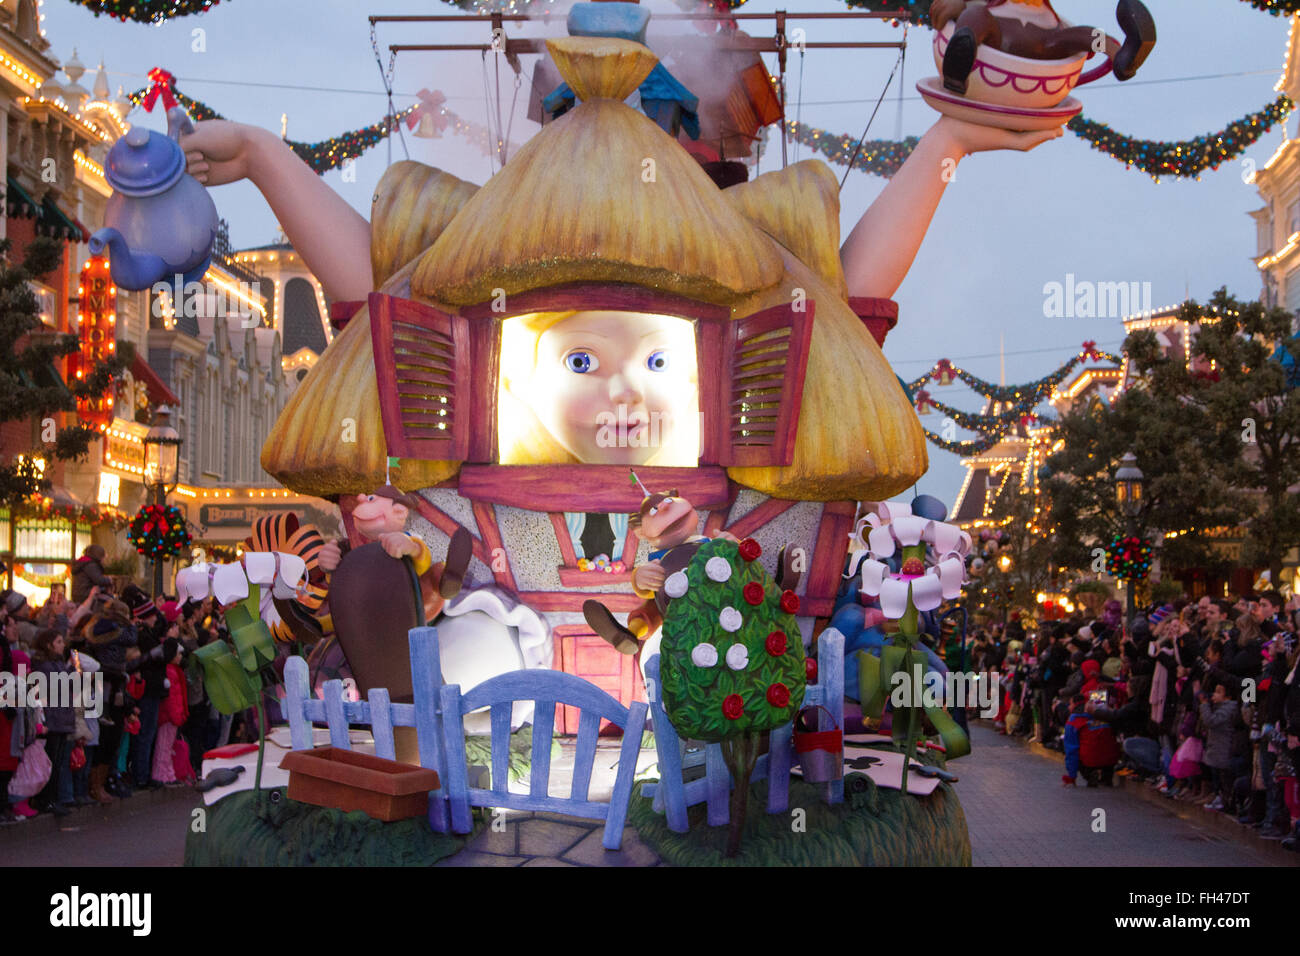 Disney Christmas Parade.Disney Christmas Parade Marne La Valee France Stock Photo